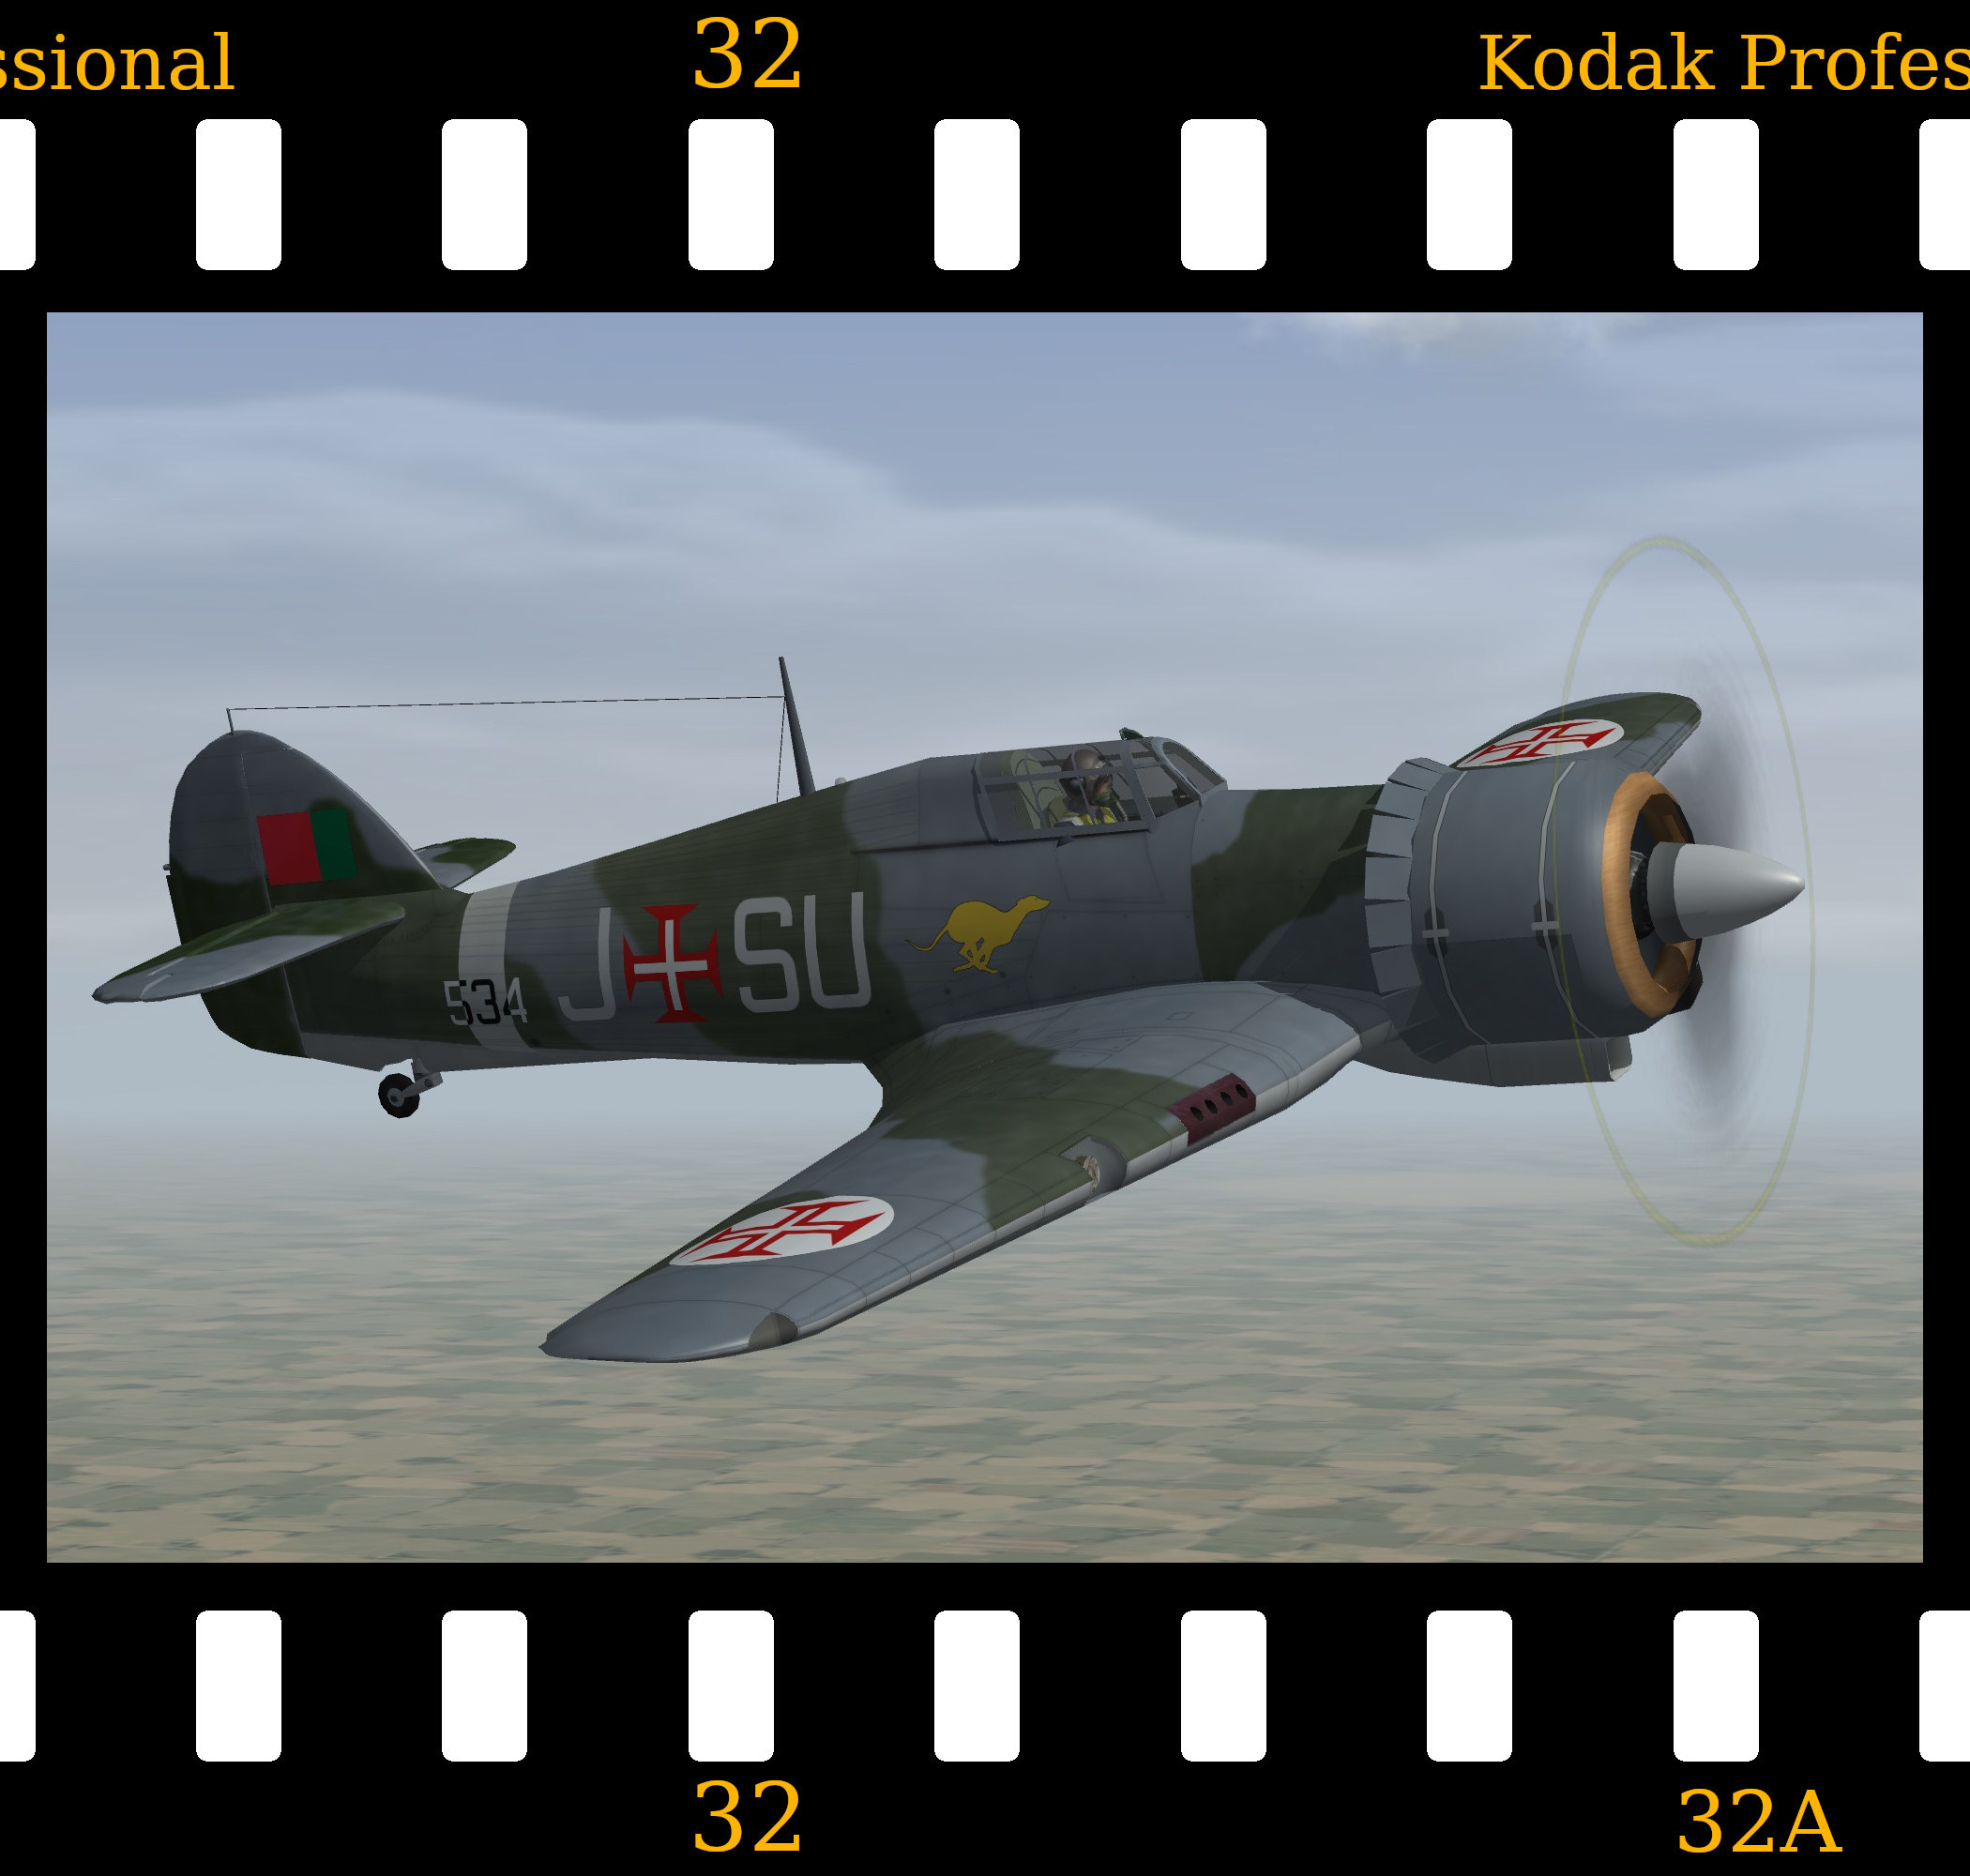 [Fictional] Hawker Hurricane 'Furacão'